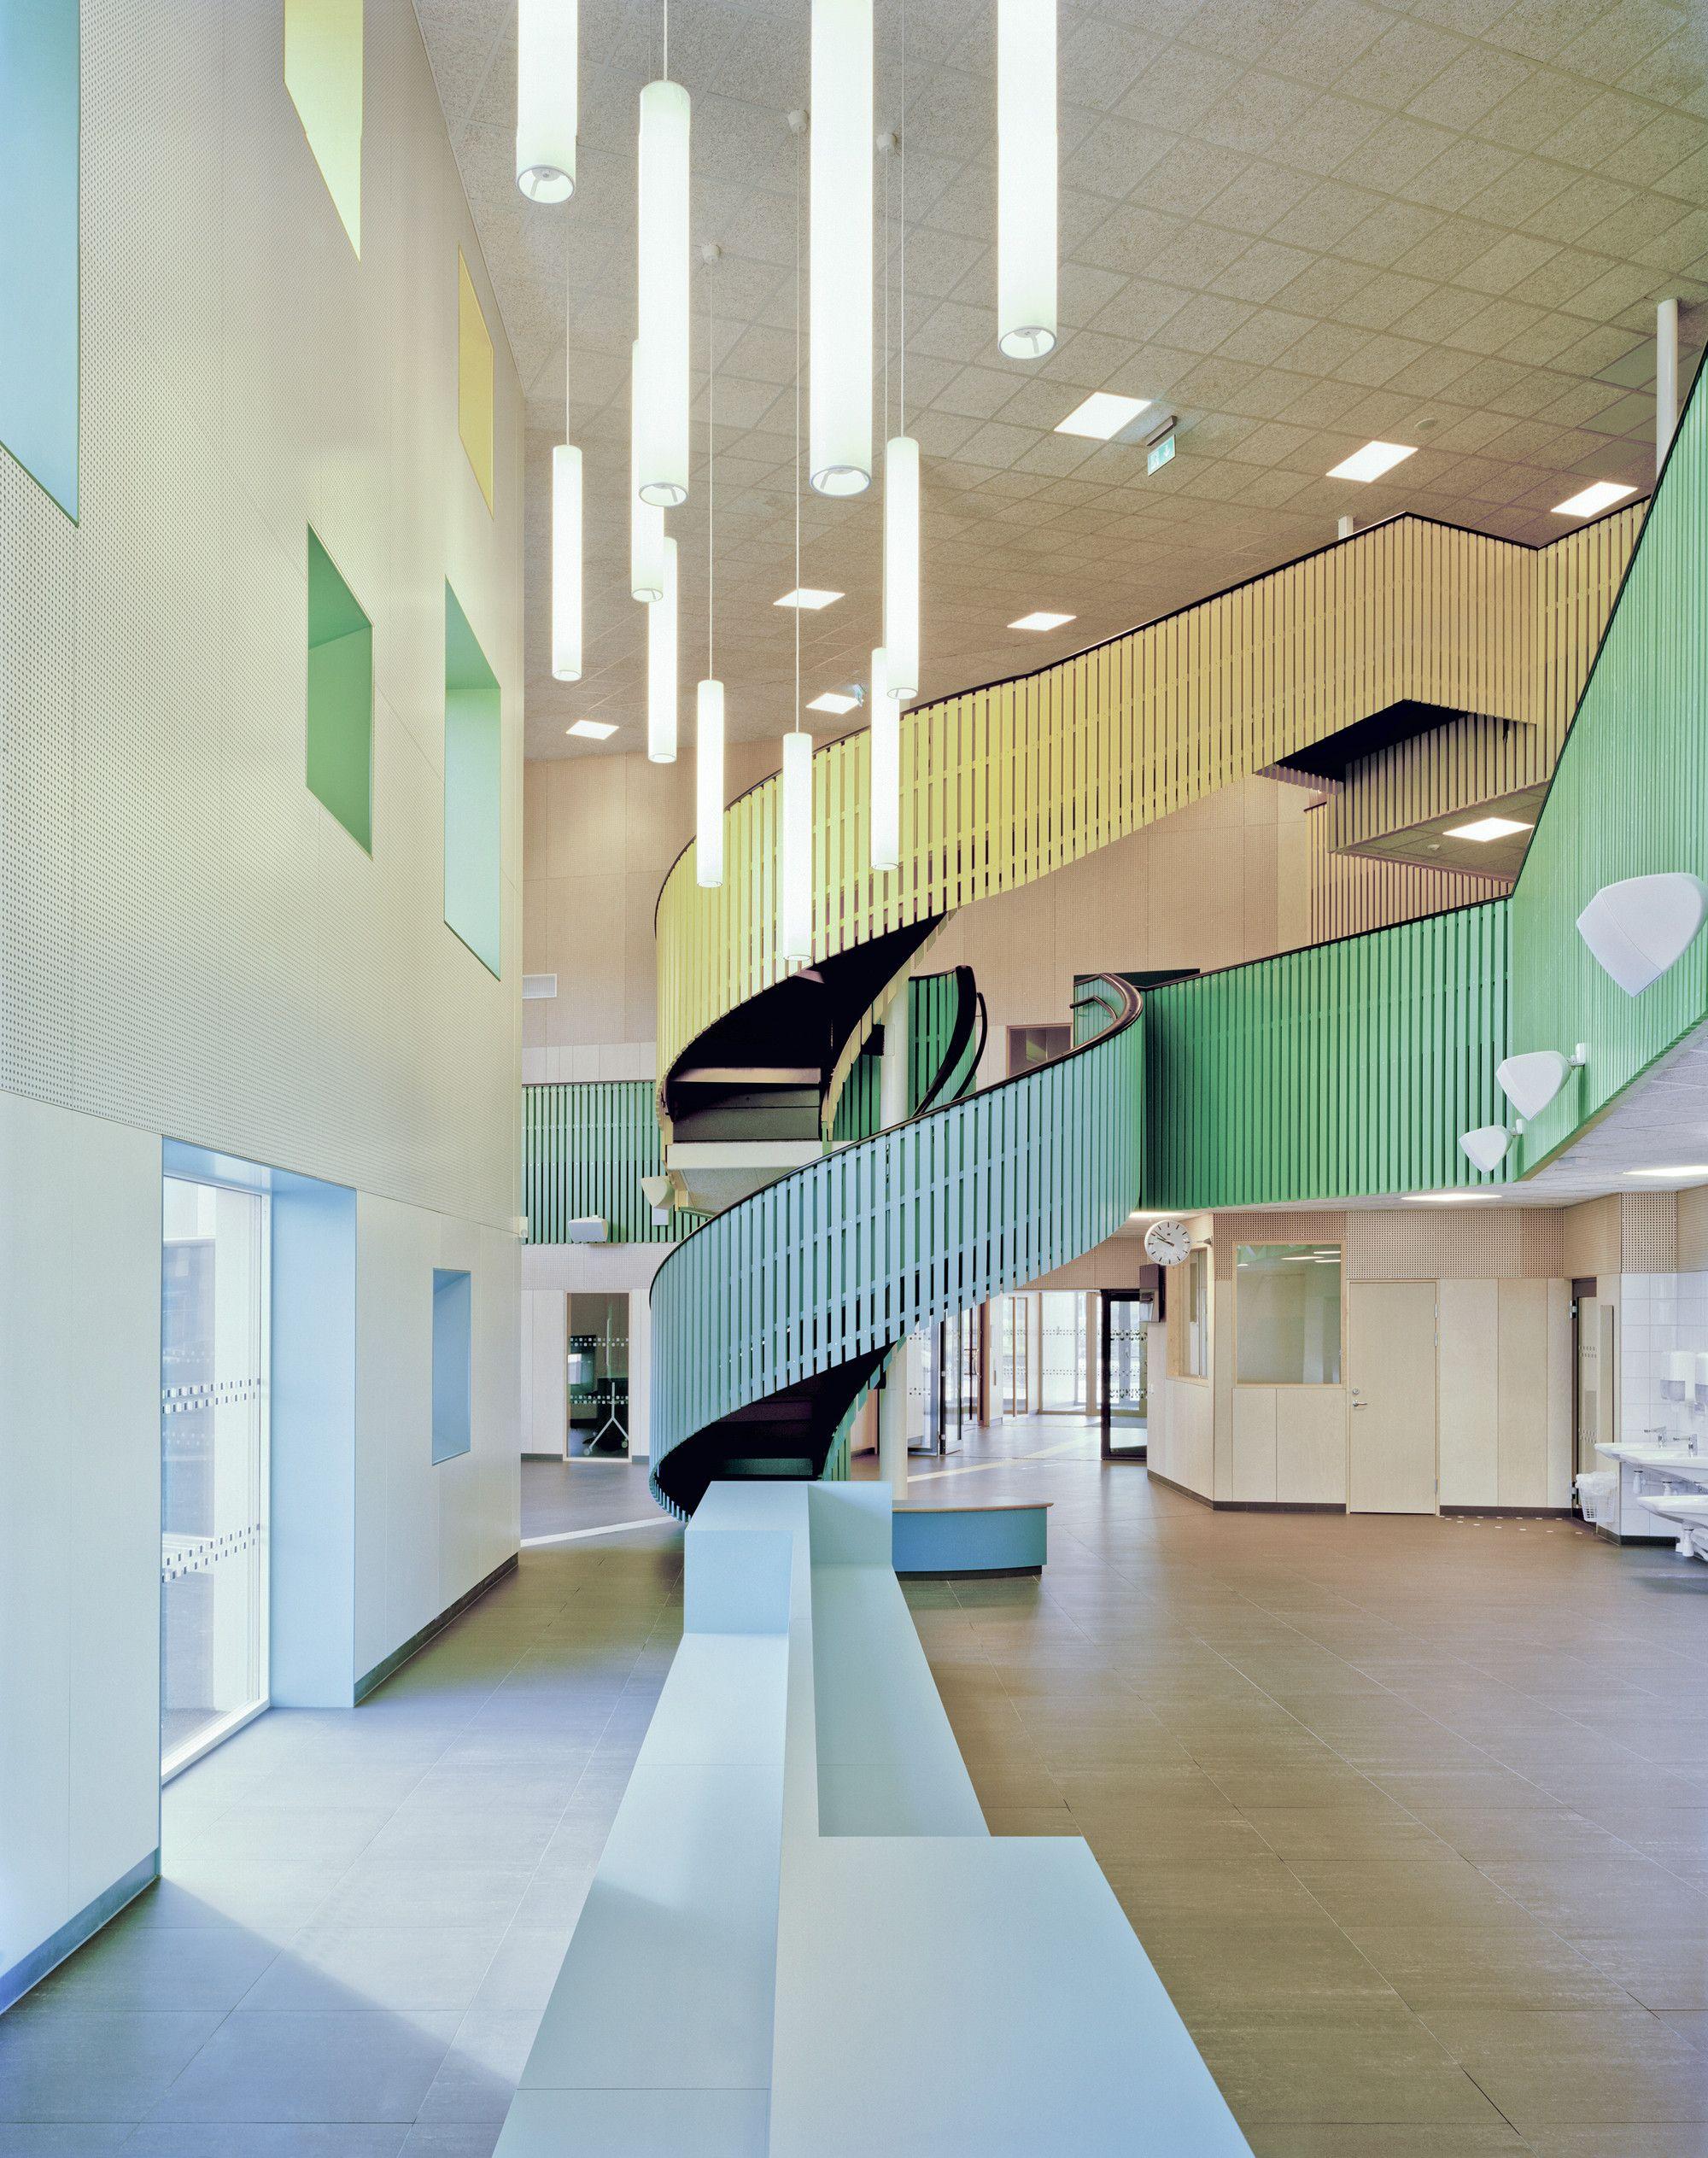 Kollaskolan School Kjellgren Kaminsky Architecture Interior Architecture Design School Architecture School Interior